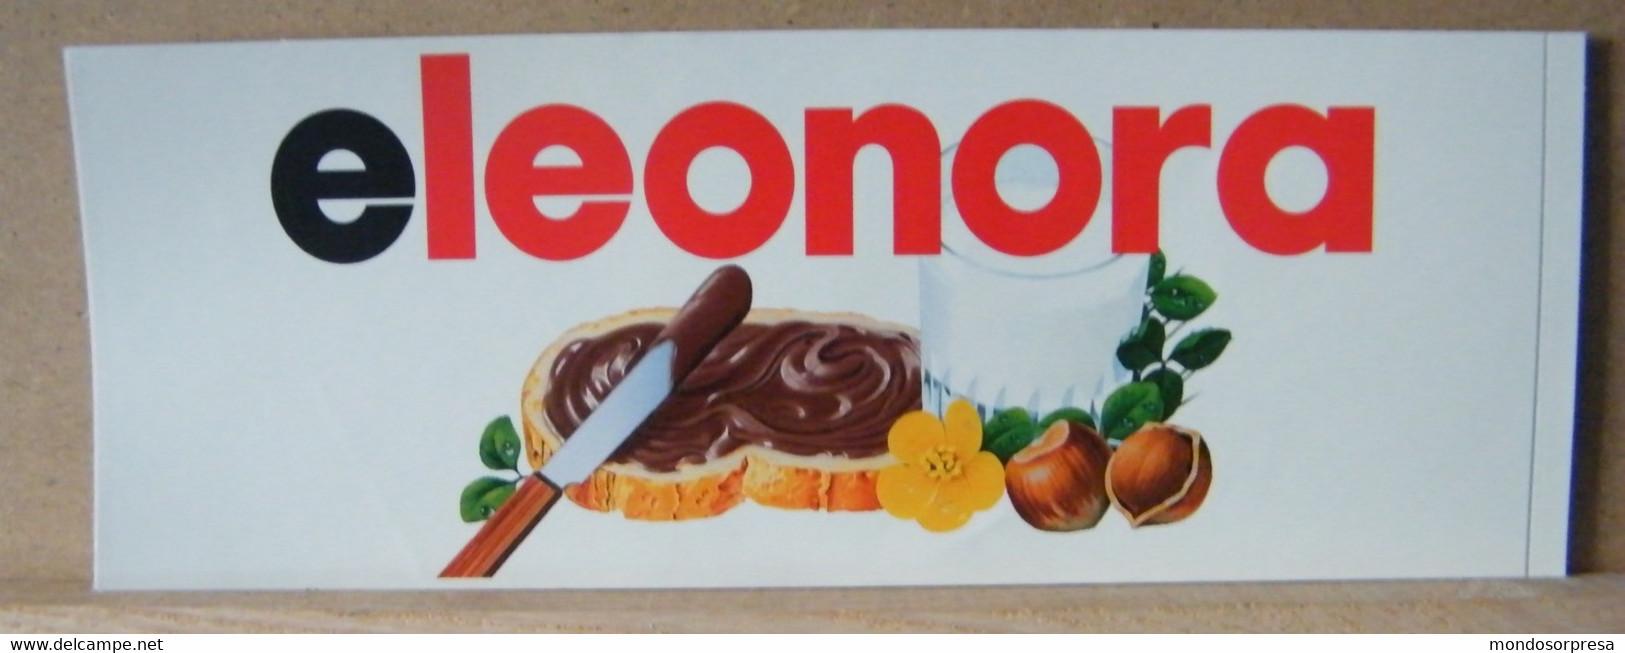 MONDOSORPRESA, ADESIVI NUTELLA NOMI, ELEONORA - Nutella